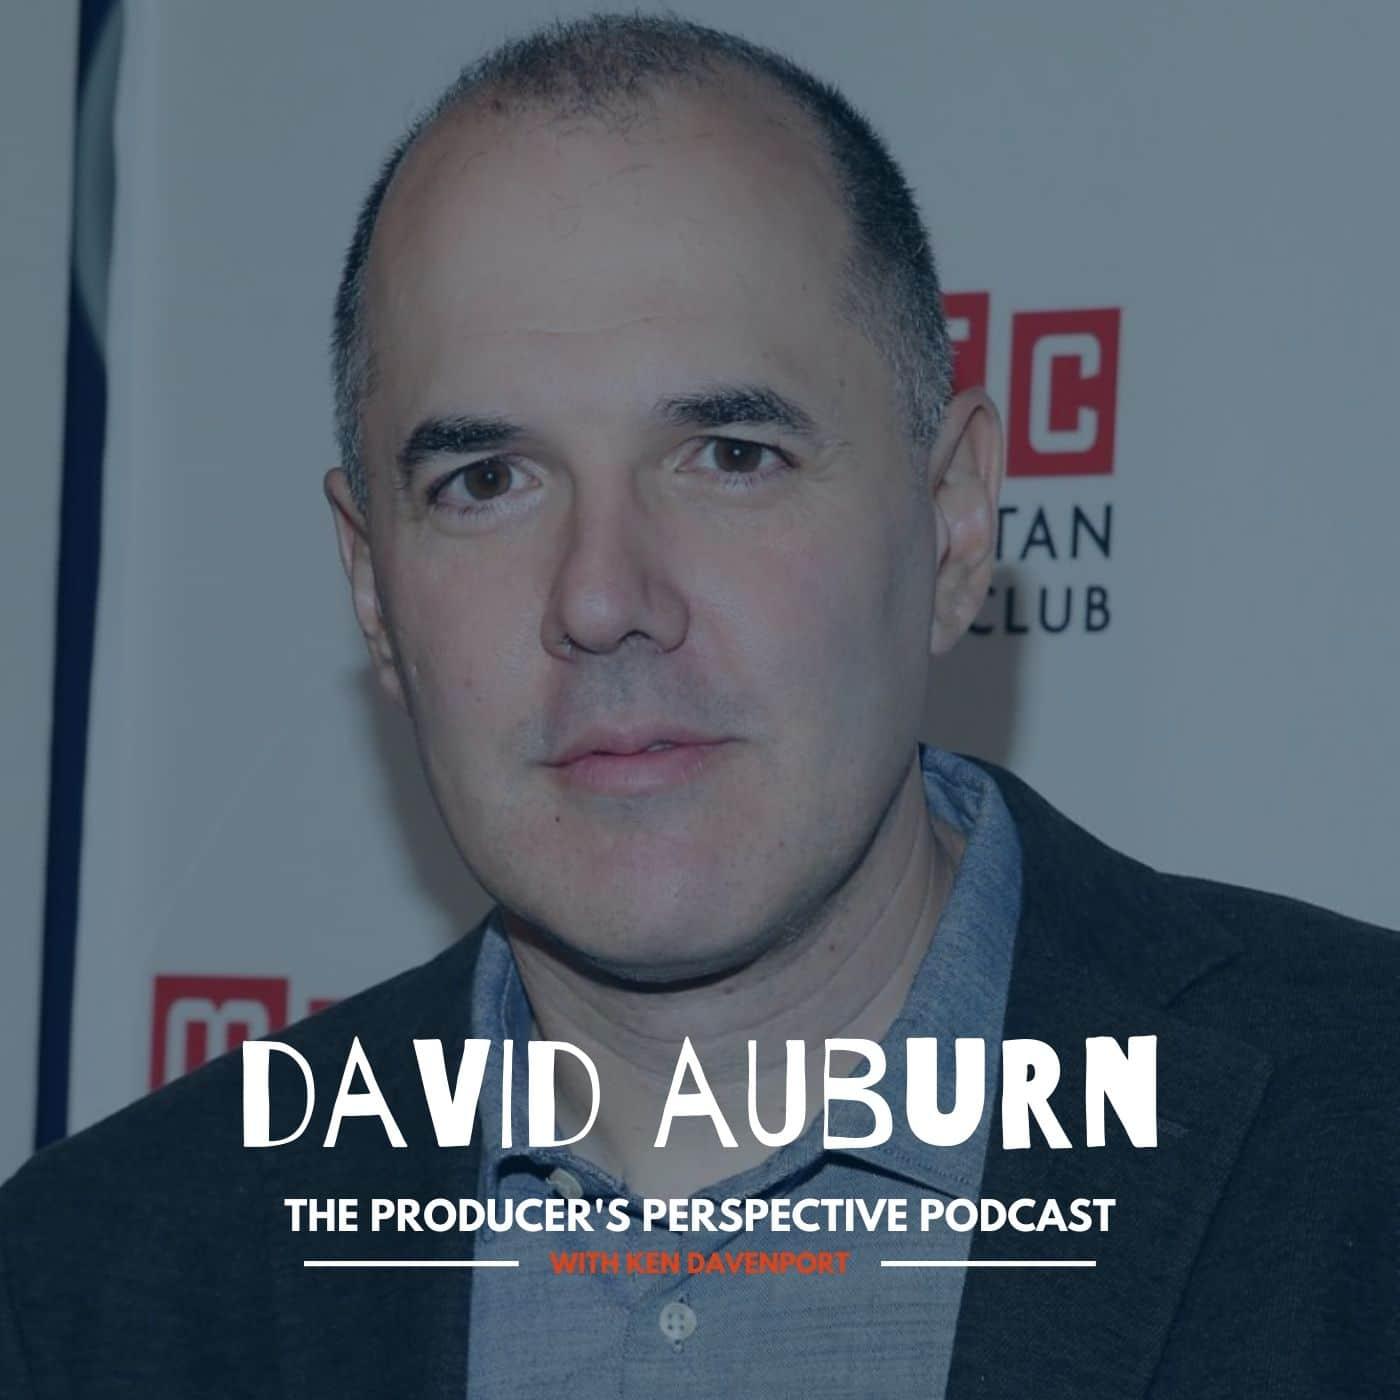 Ken Davenport's The Producer's Perspective Podcast Episode 159 - David Auburn